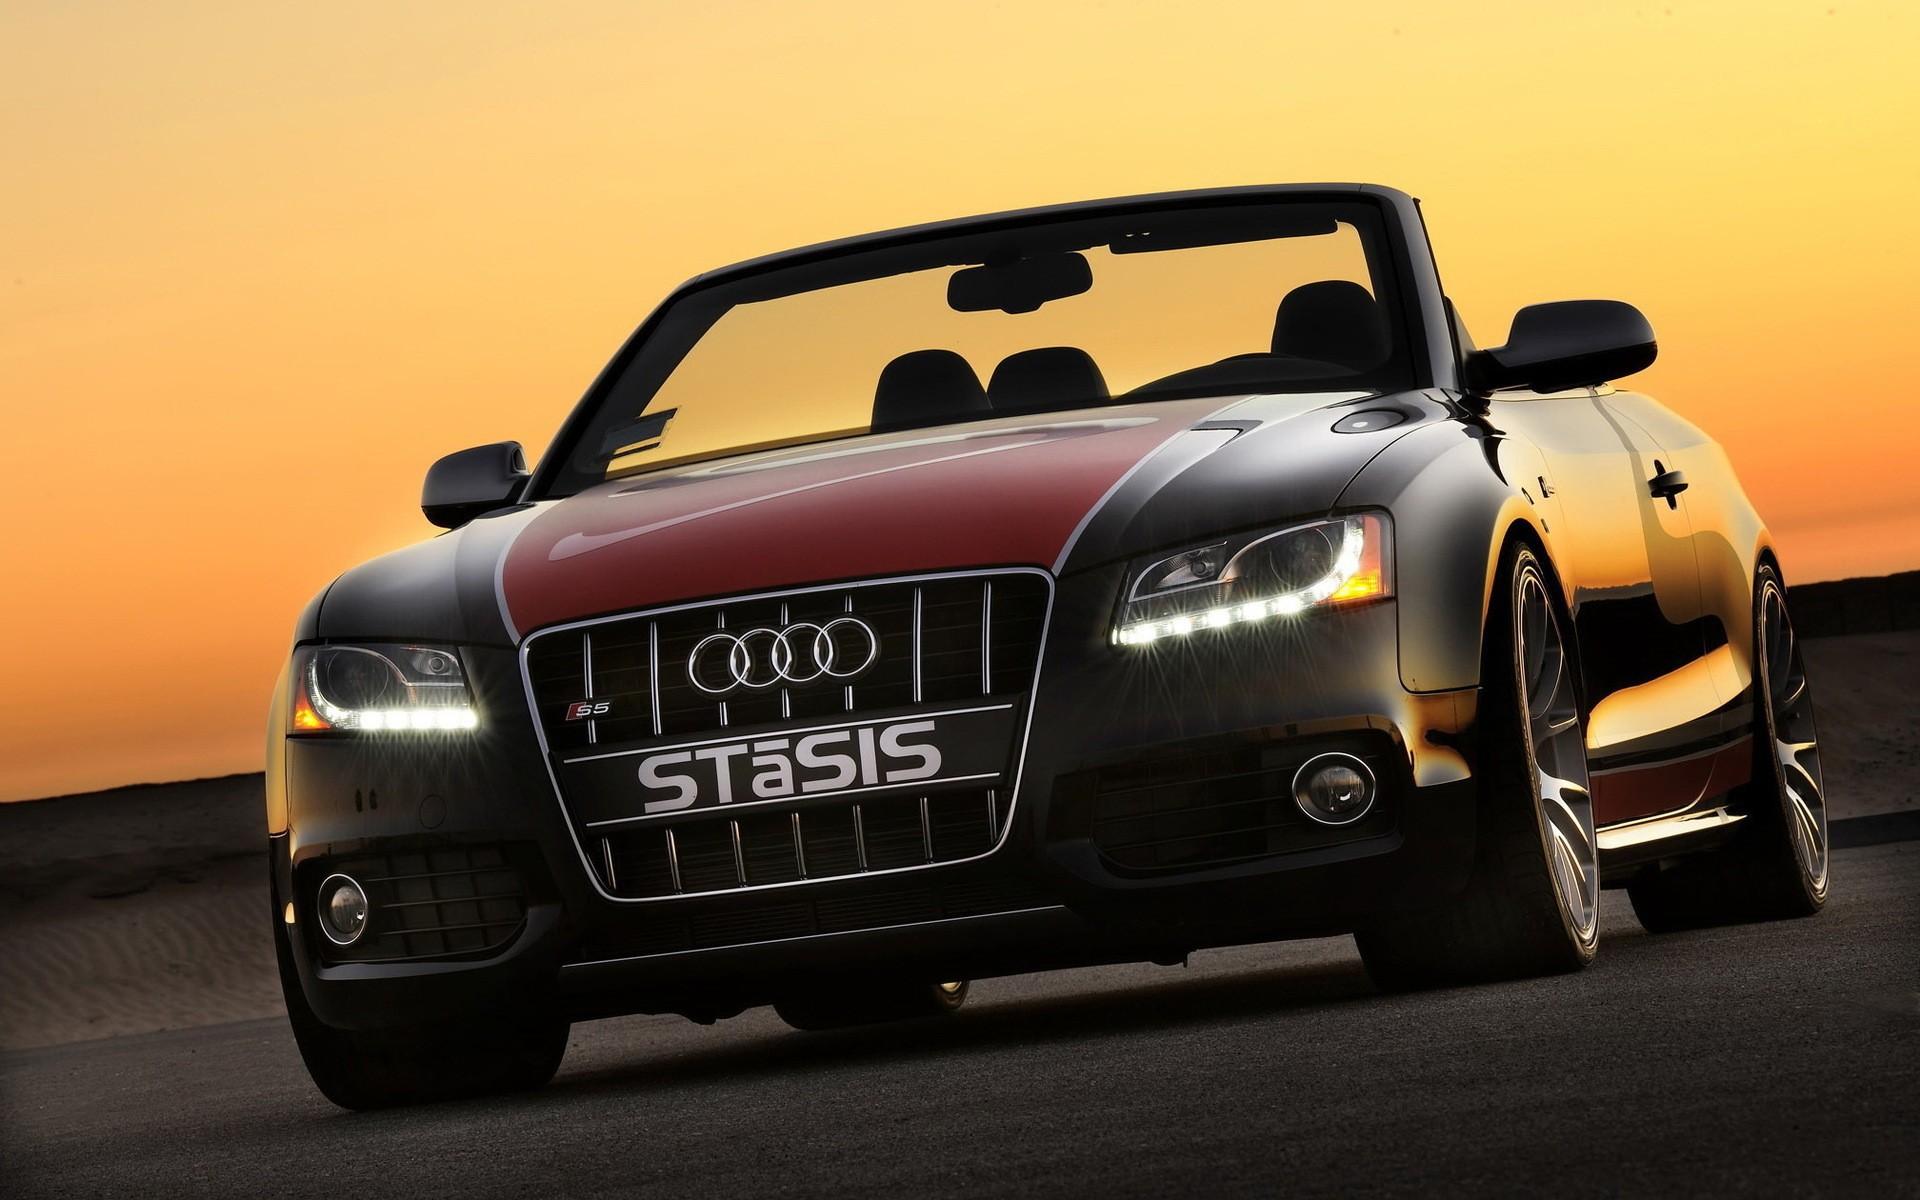 Audi Stasis 2014 - 1920x1200